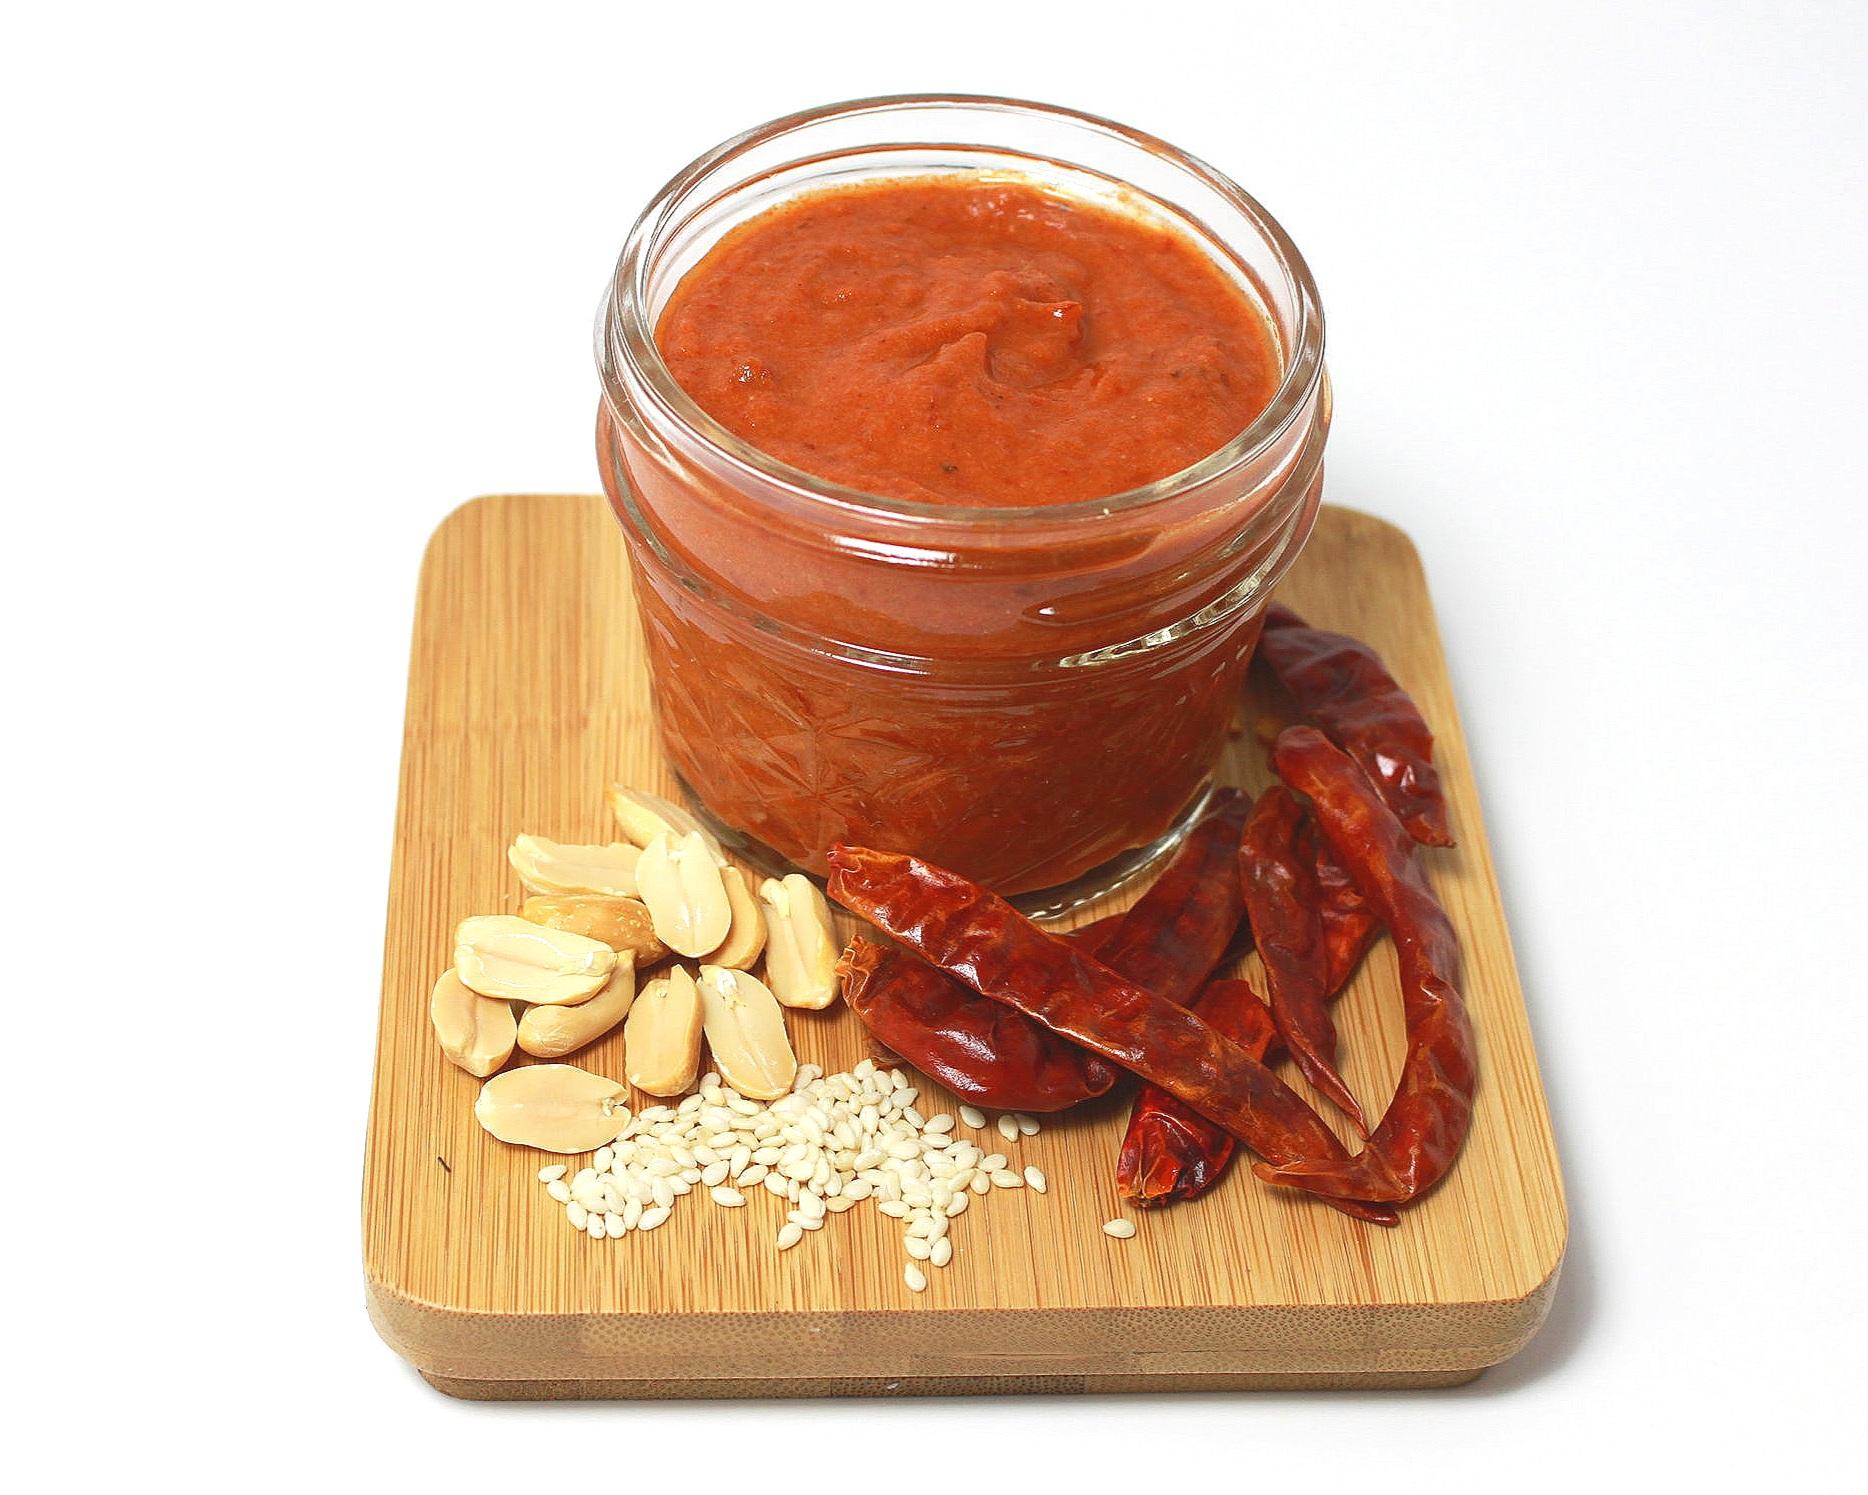 MACHA ARABE ЁЯМ╢я╕П - Tomato, Sesame, Chile de ├Бrbol.